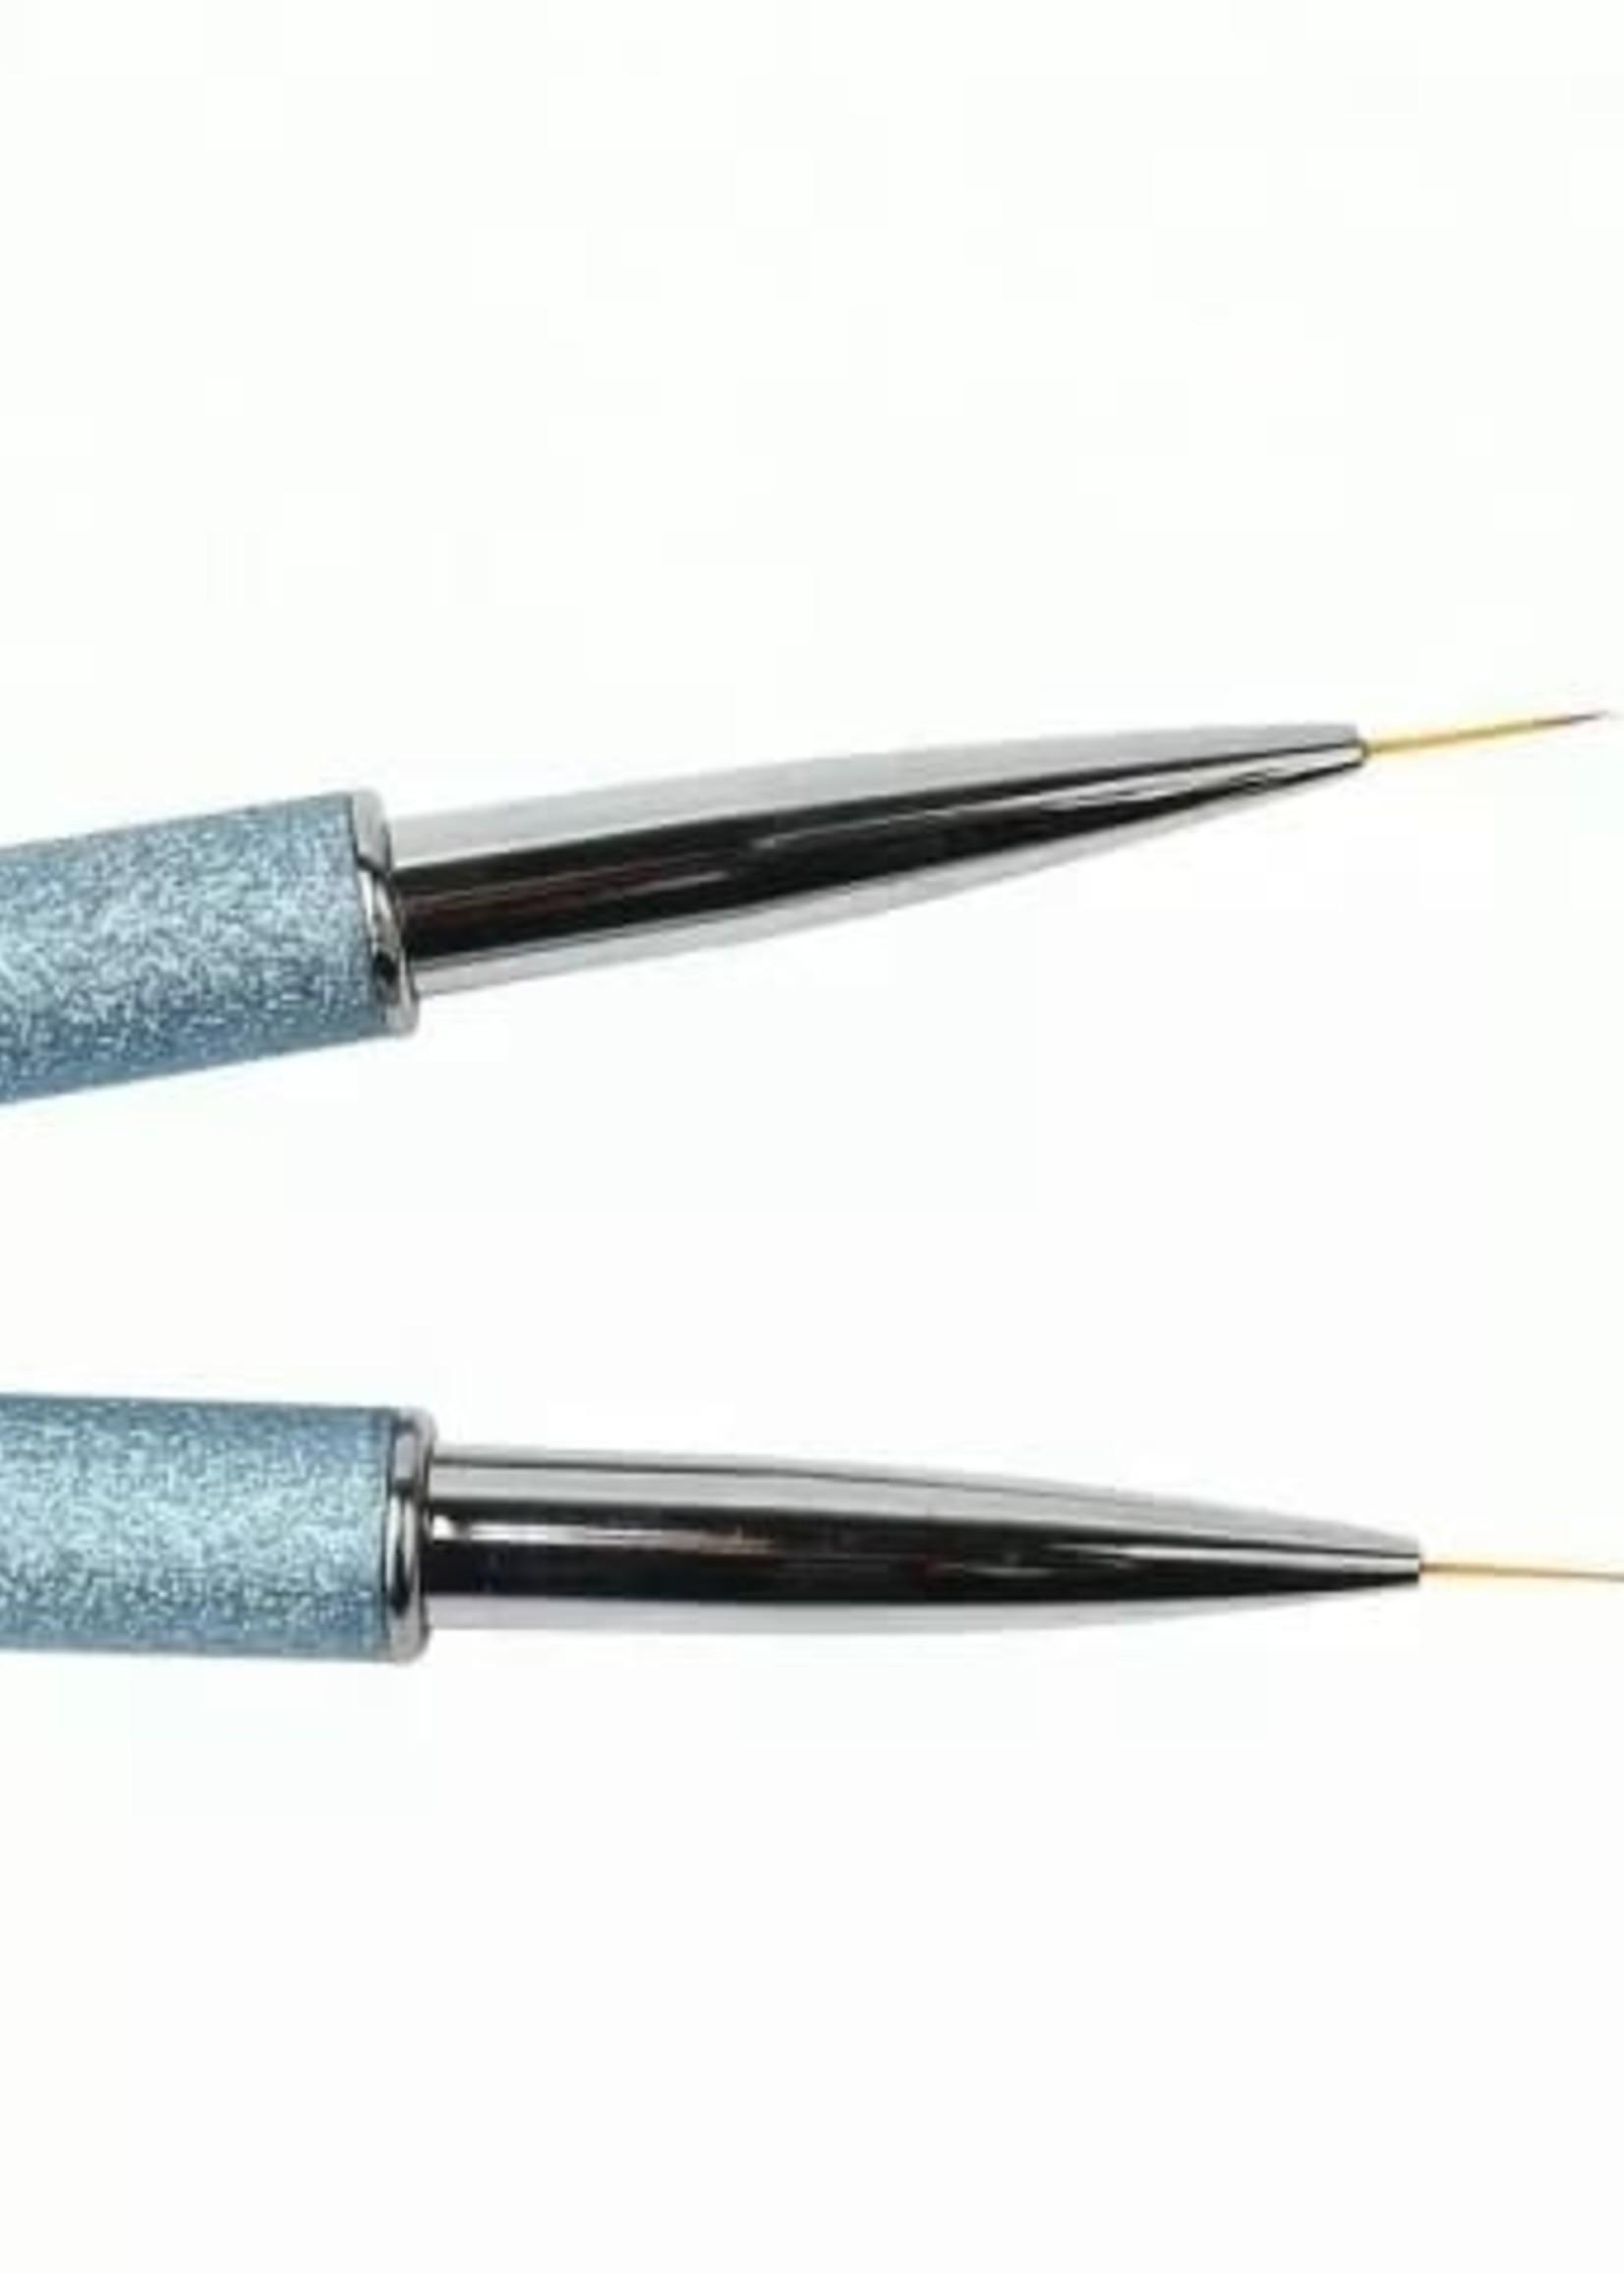 Nail art brushes set 3 pieces